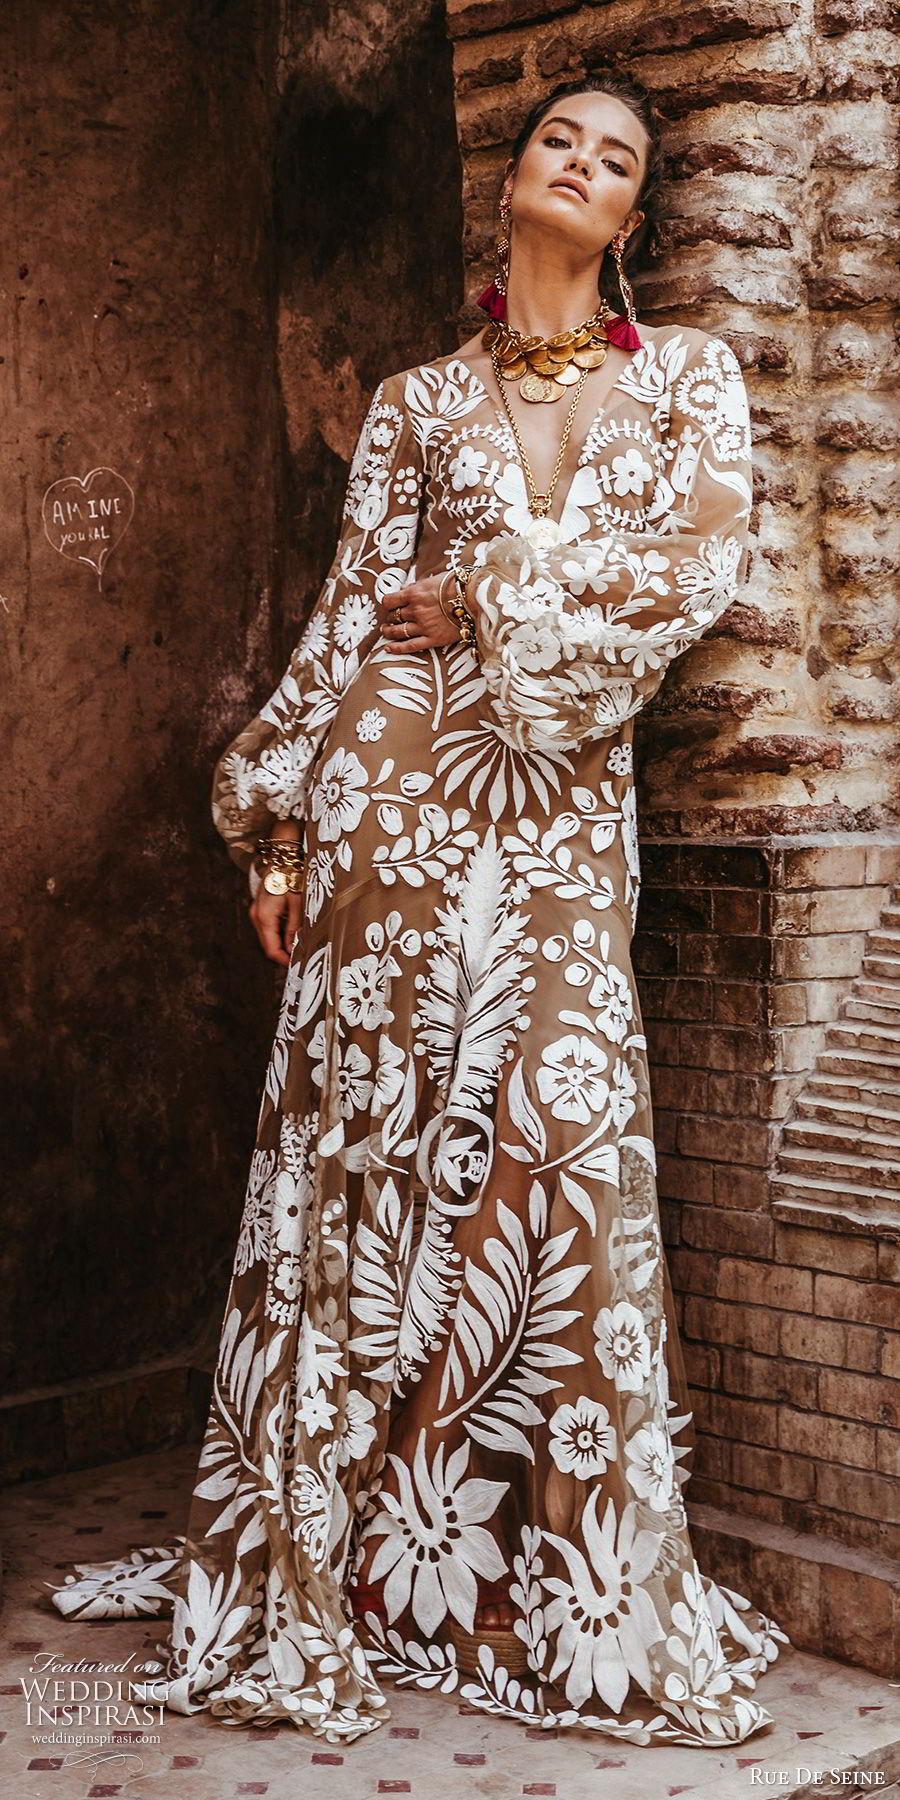 rue de seine 2019 bridal long bishop sleeves deep v neckline trumpet fit flare fully embroidered a line wedding dress (1) boho chic romantic low open back chapel train mv